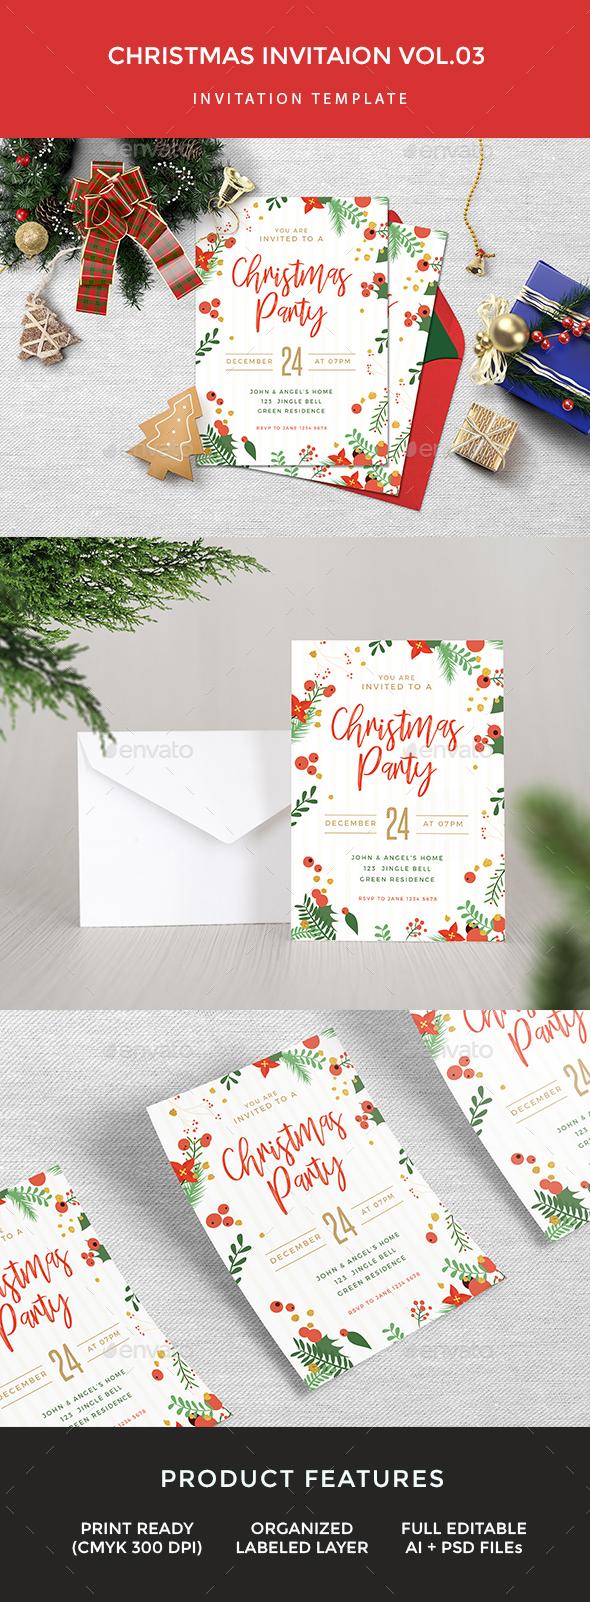 Christmas Invitation - Invitations Cards & Invites